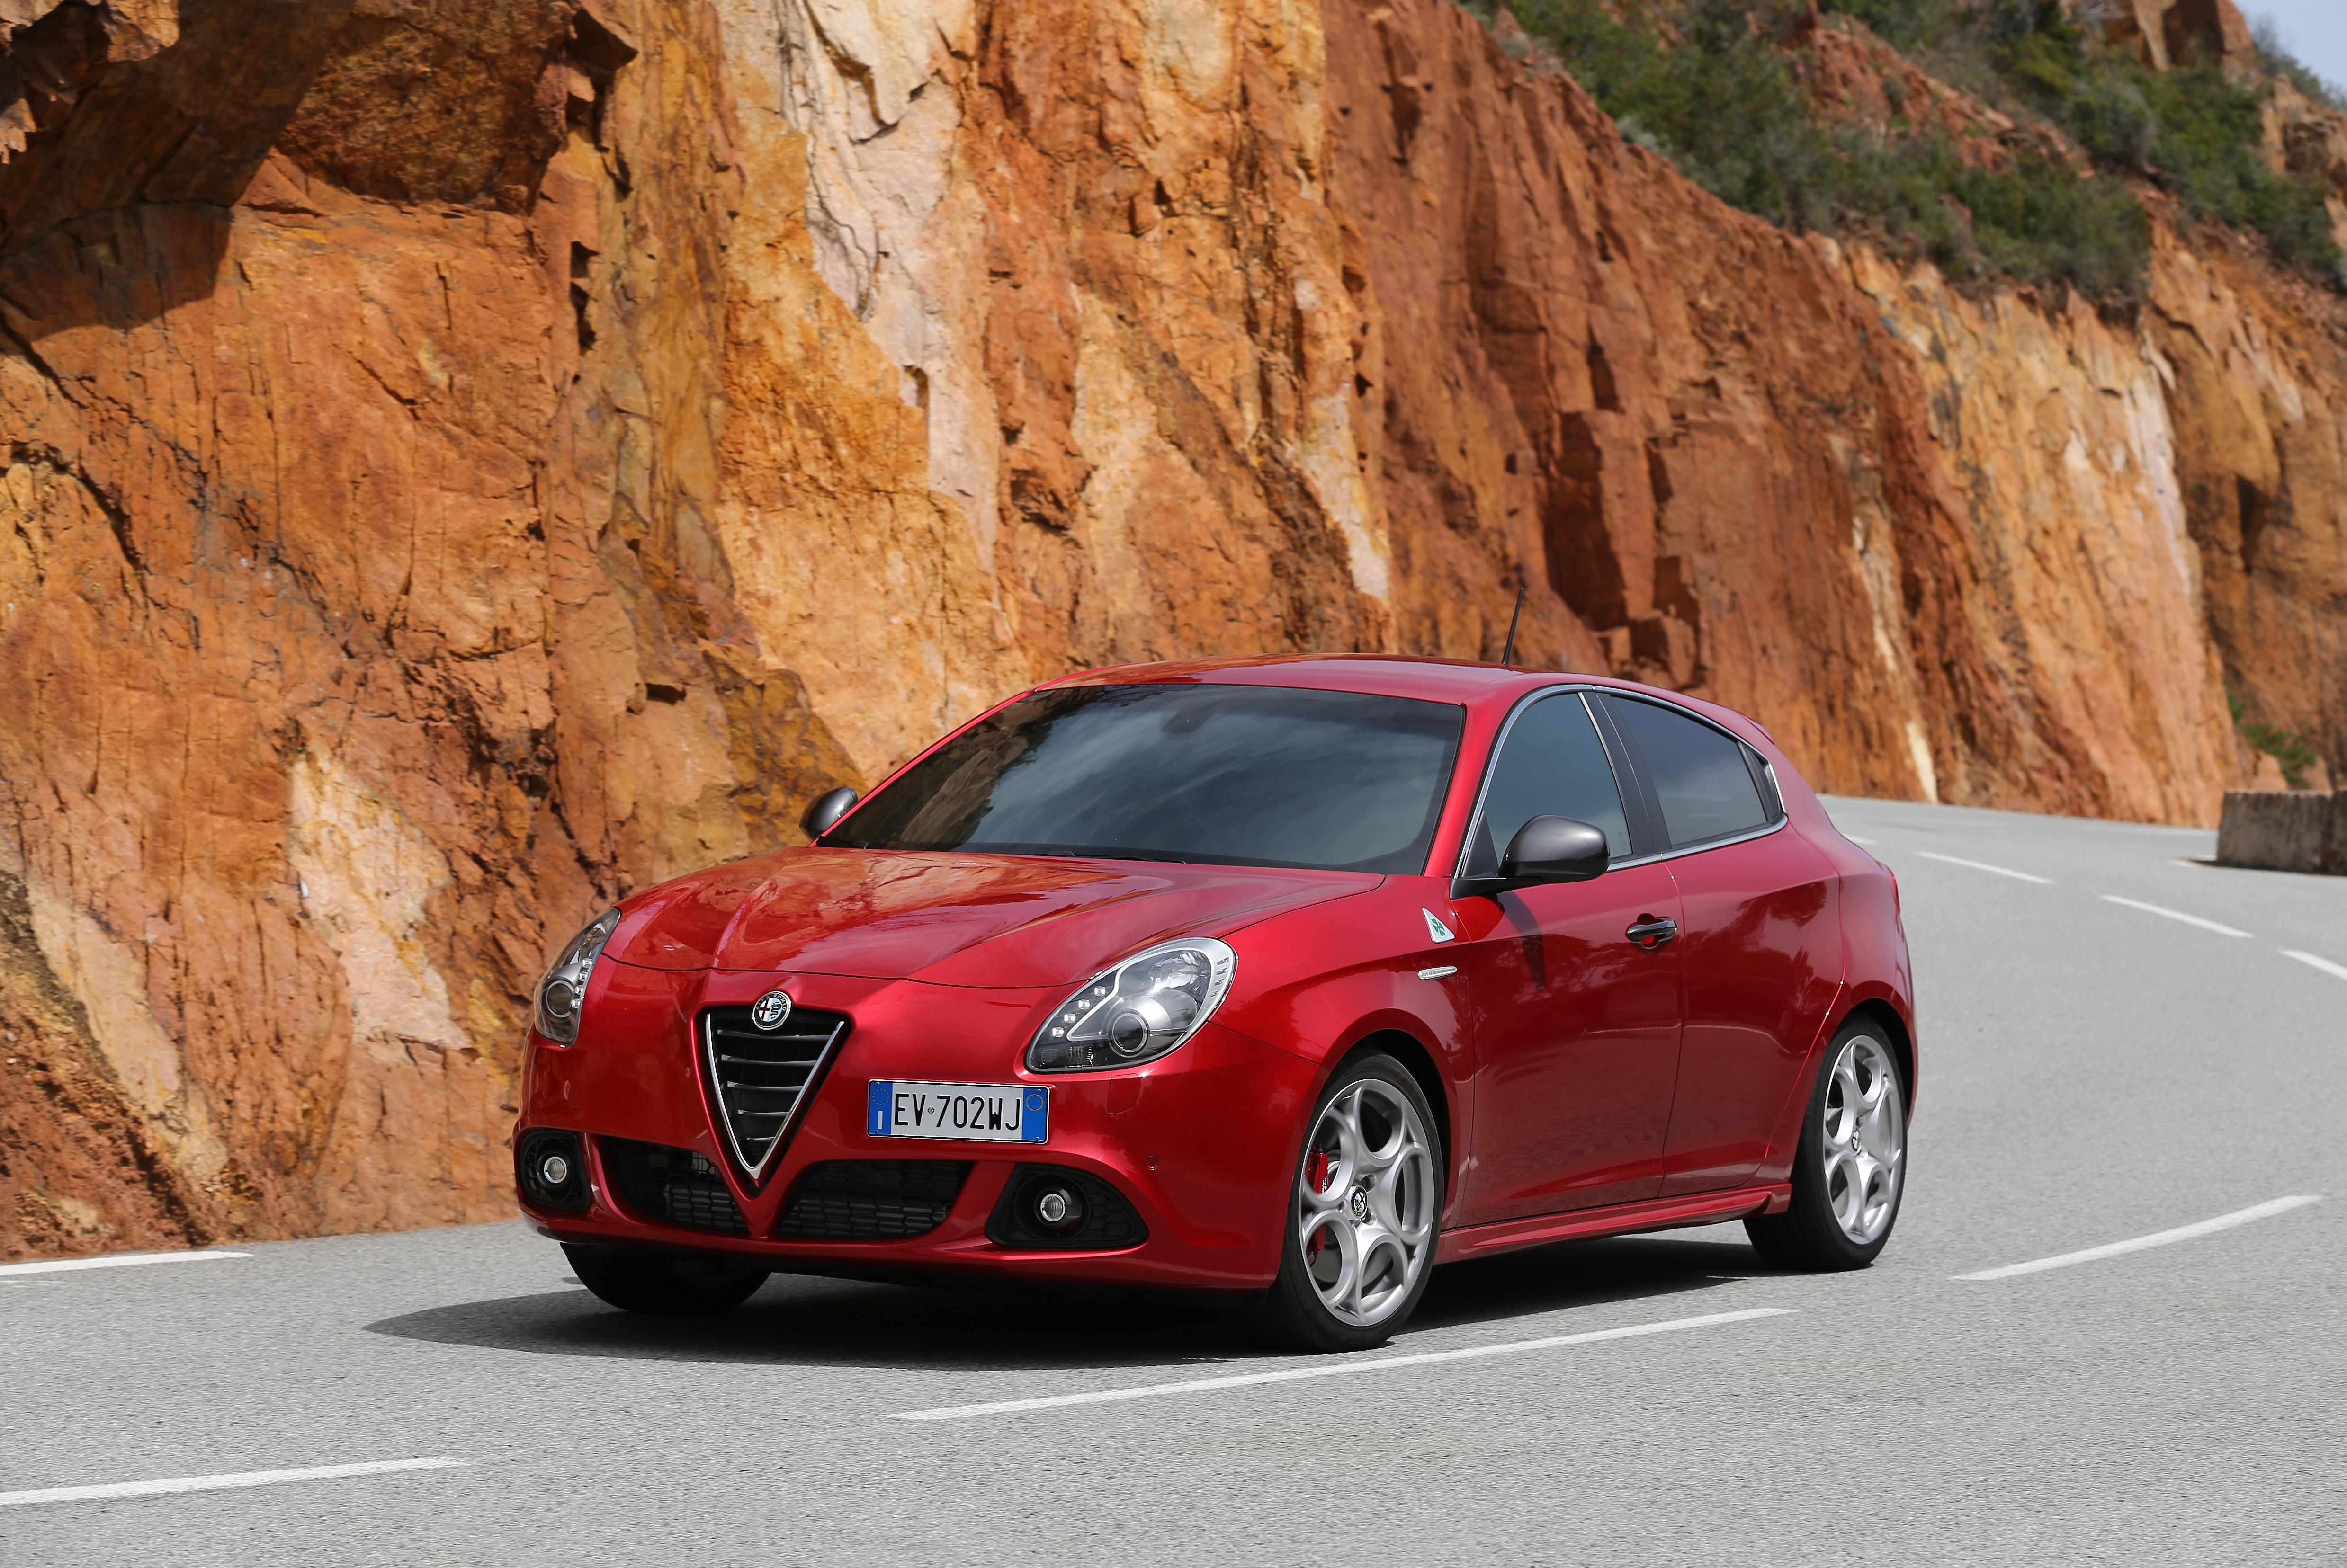 Alfa romeo giulietta technical specifications 15